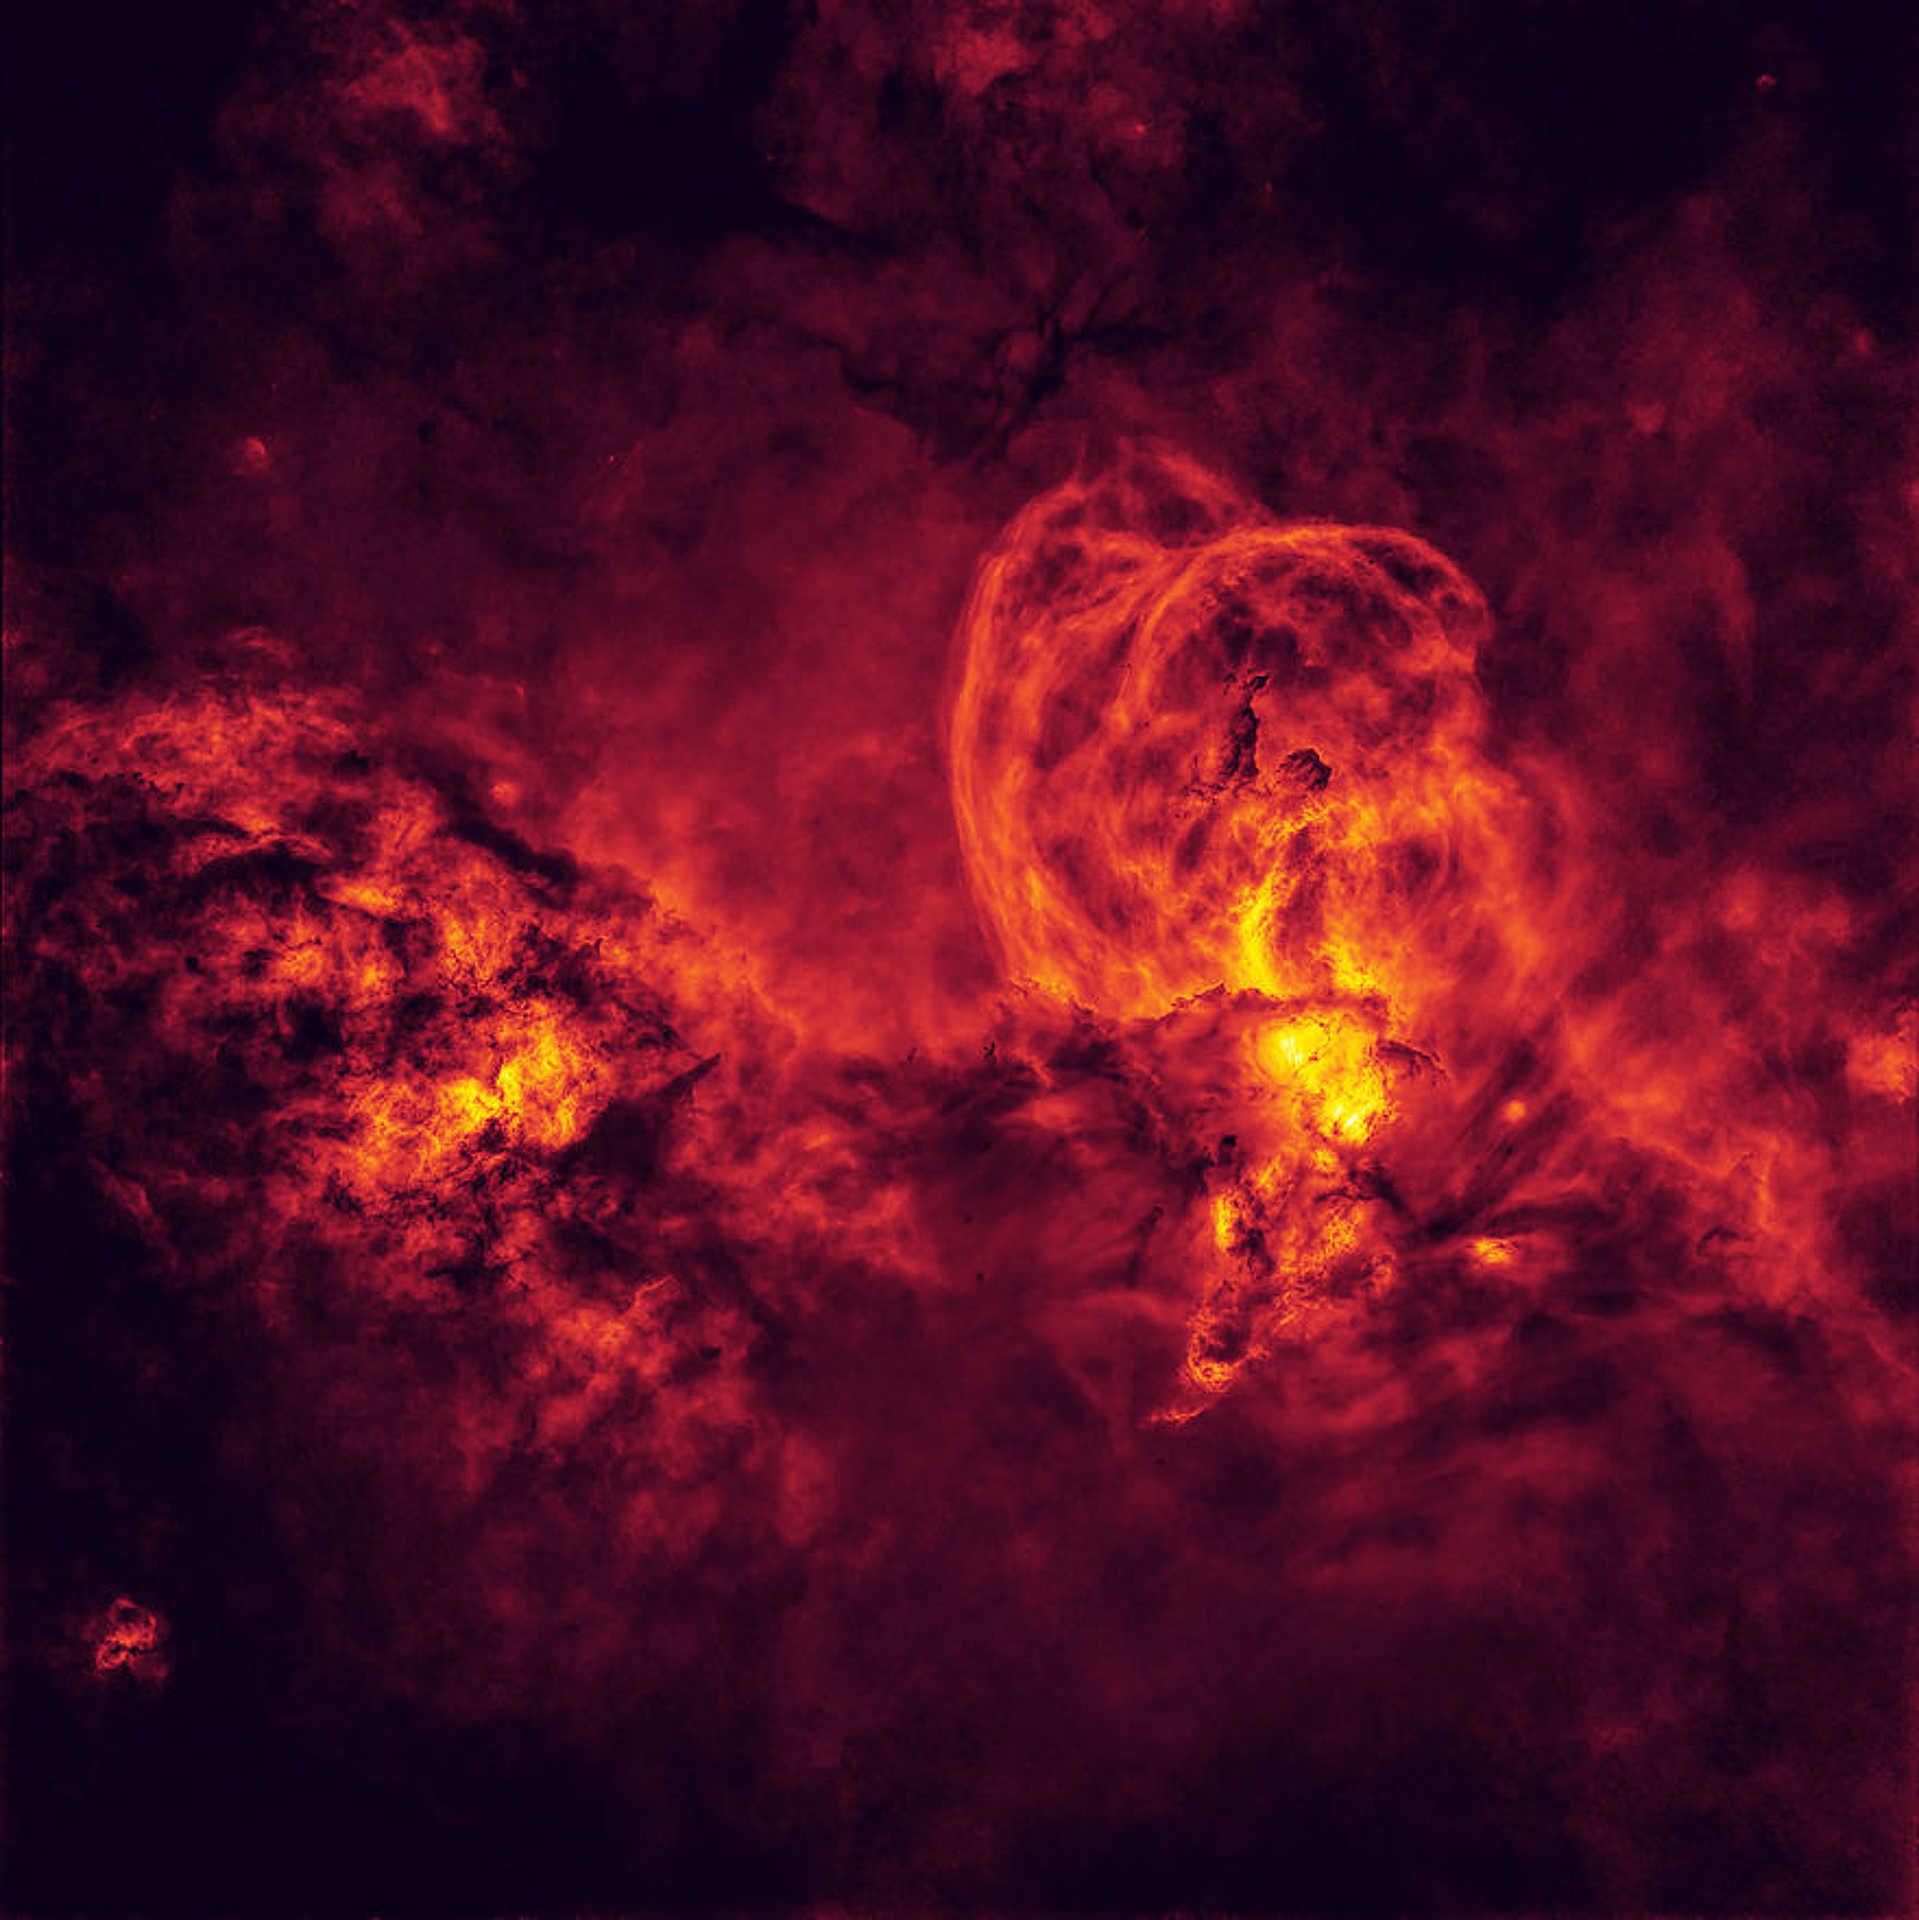 Peter Ward - Cosmic Inferno